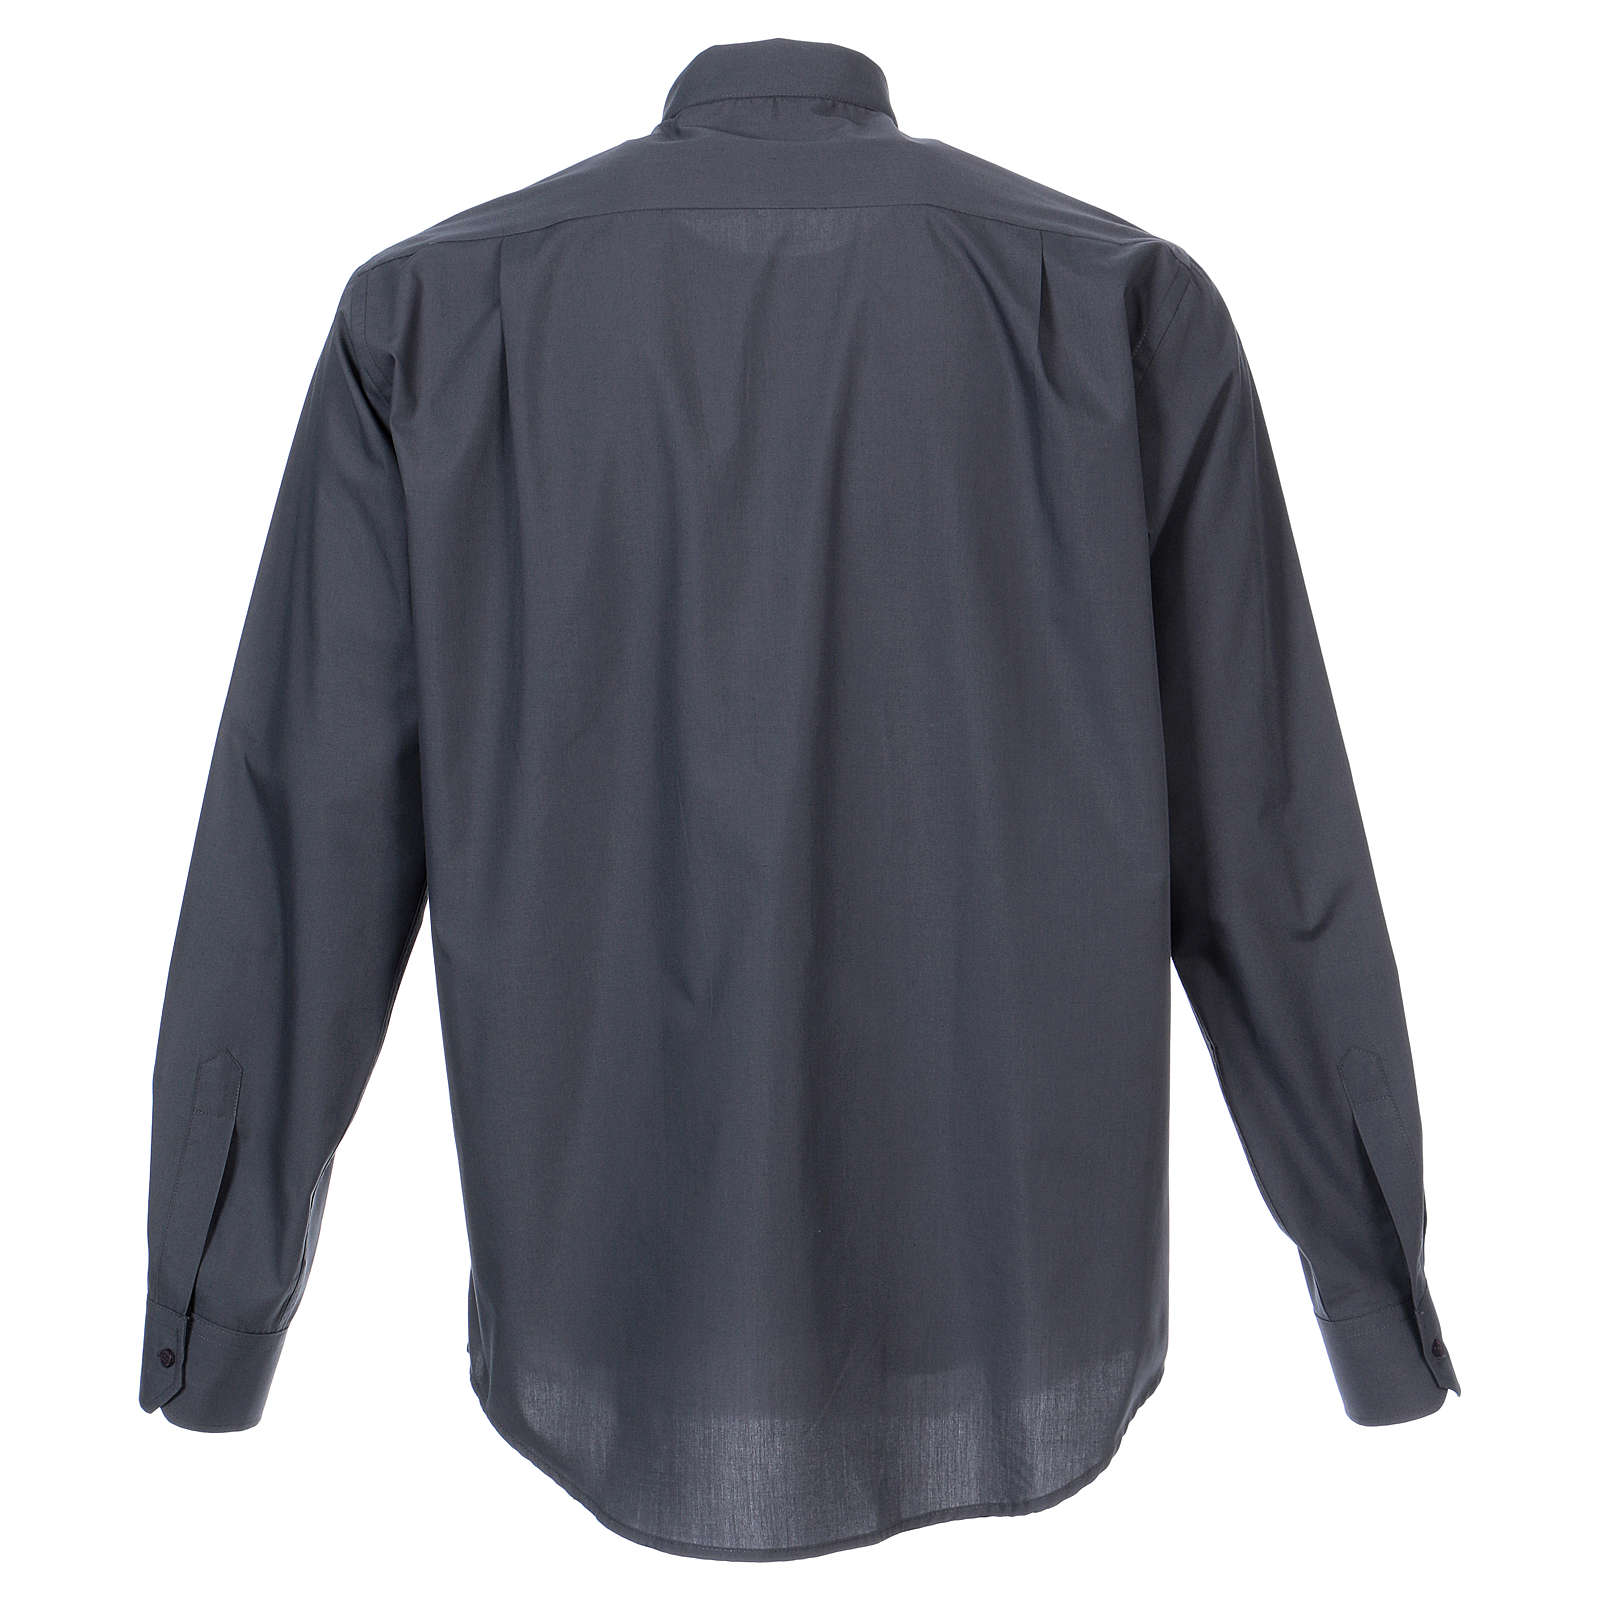 Camisa Clergyman manga longa misto algodão cinzento escuro In Primis 4